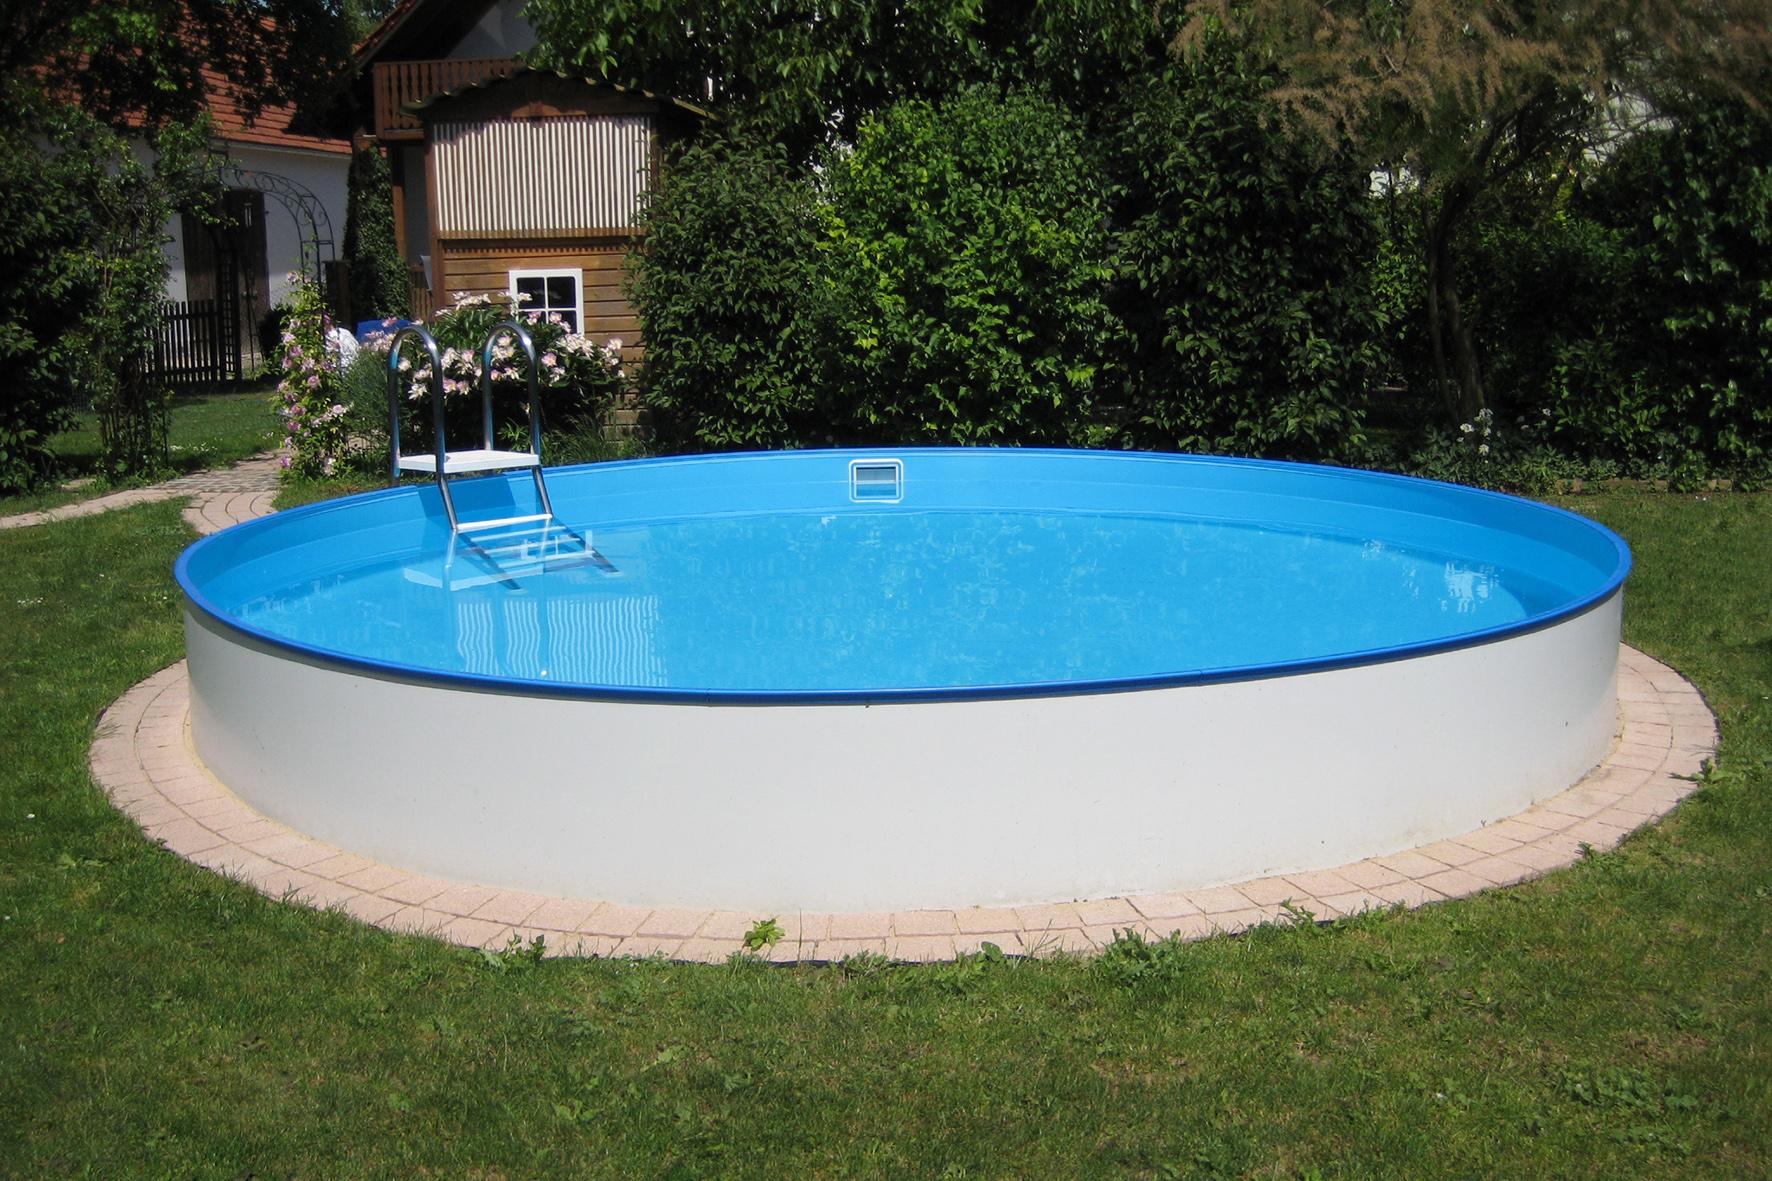 Planet Pool Rundbecken Exklusiv Ø 200x120cm (SW:0,6 IH:0,6)